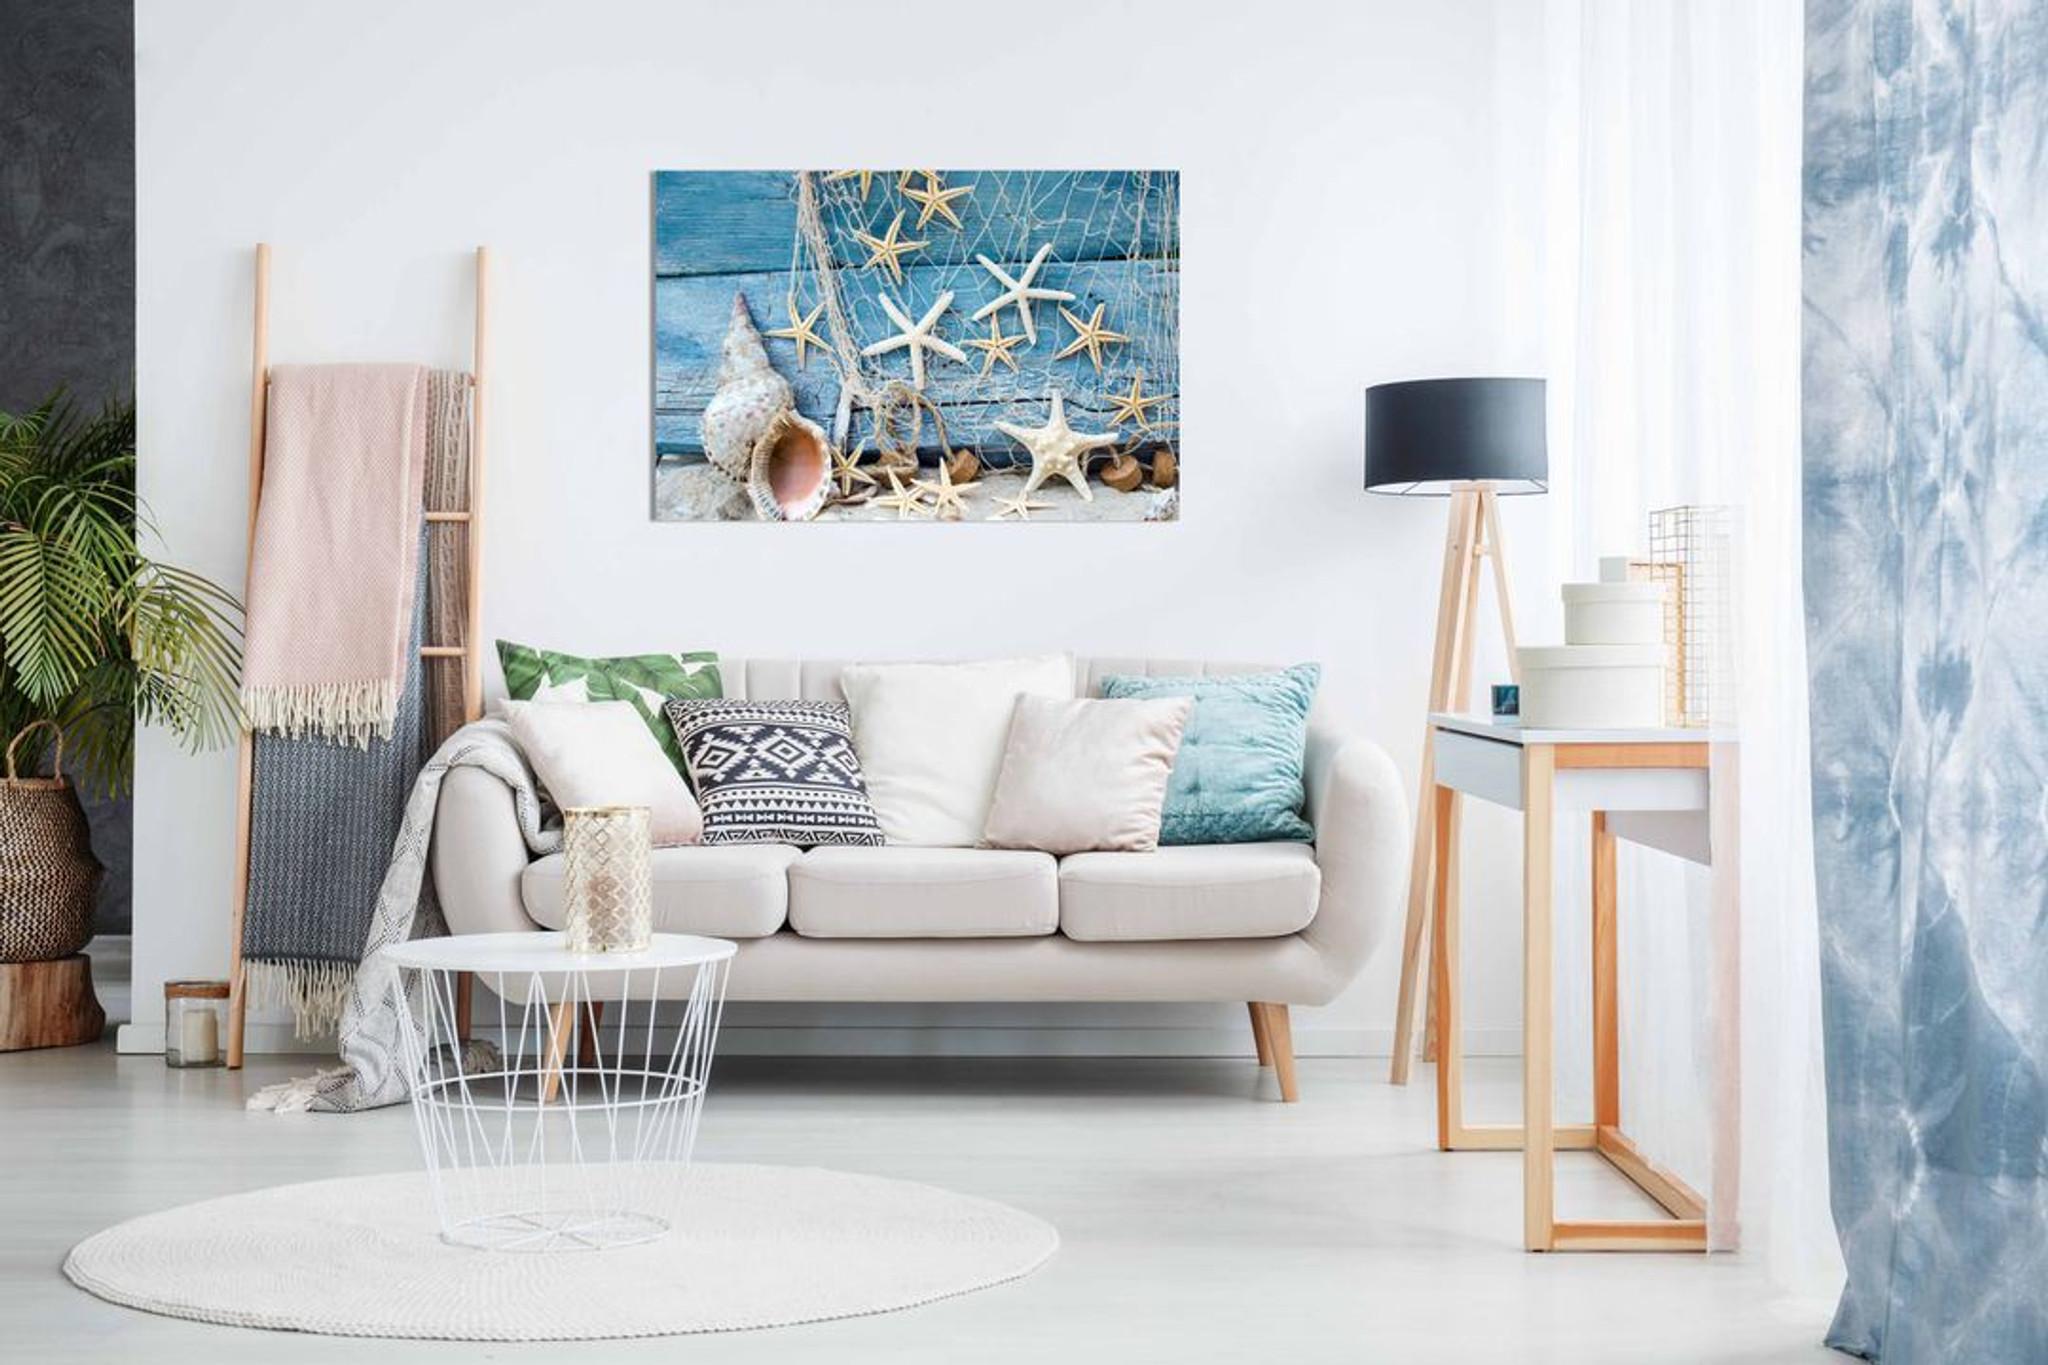 Blue Maritime Sea Bathroom Canvas Wall Art Picture Print Home Decor